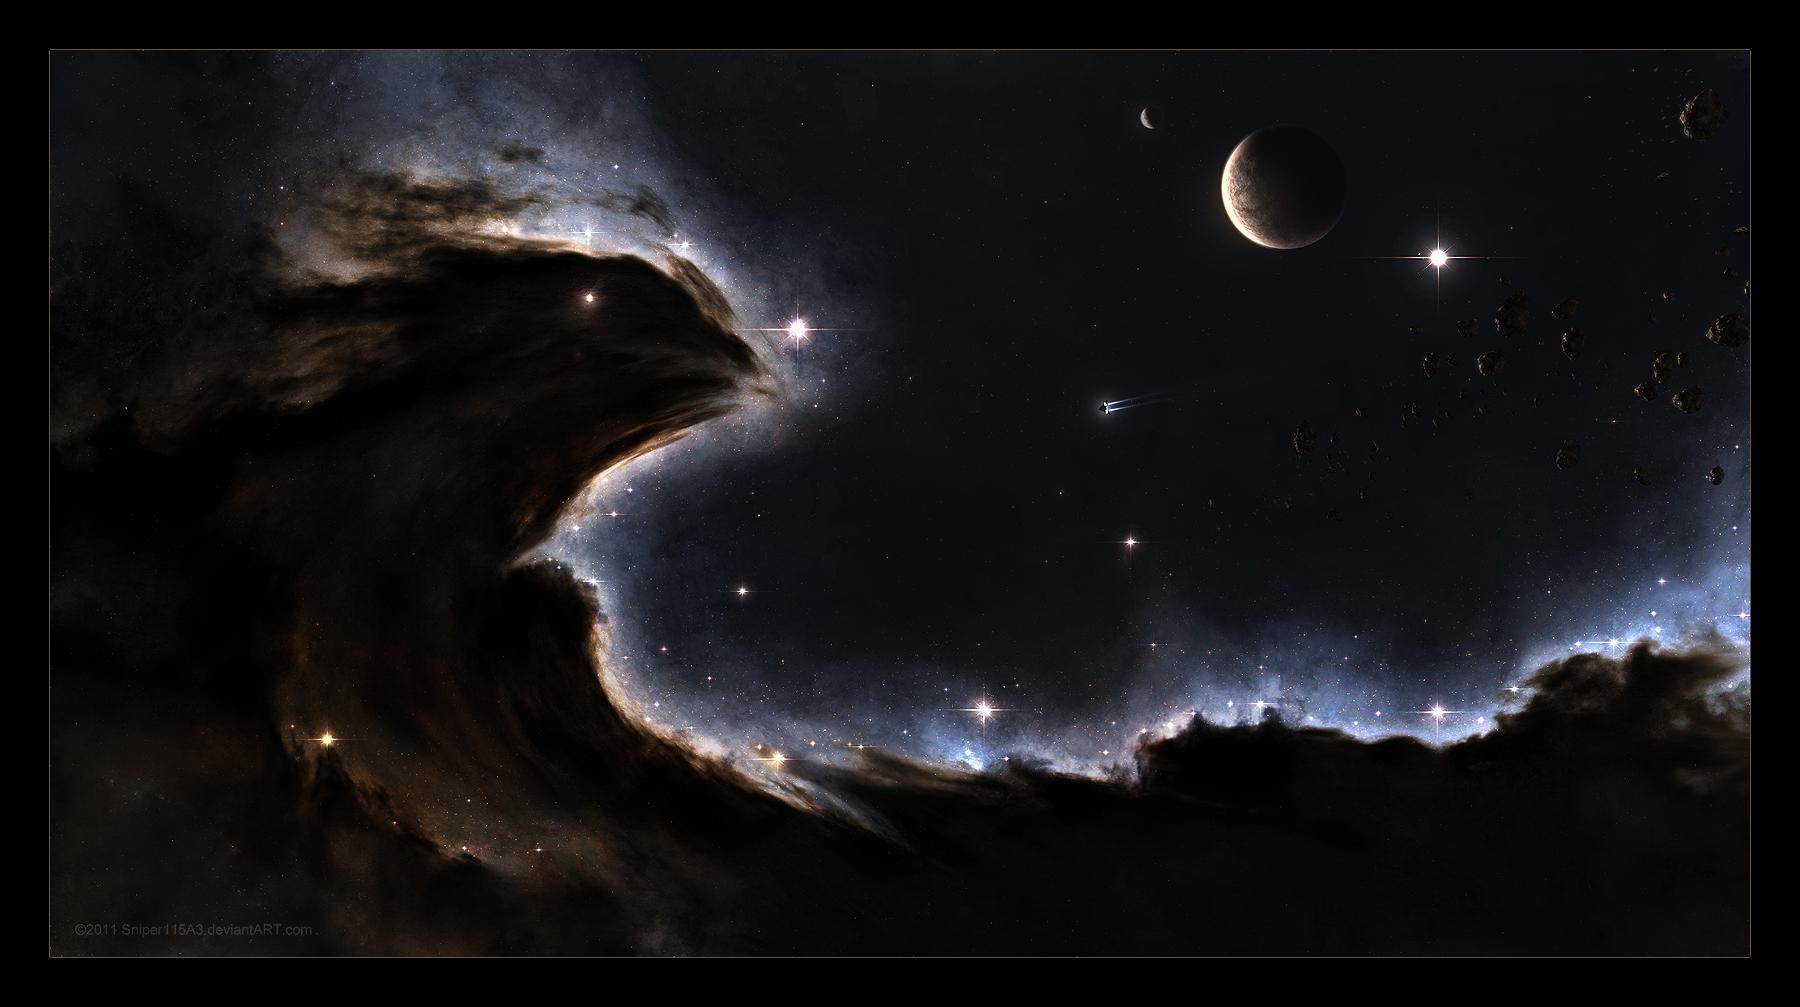 The Dragon Nebula